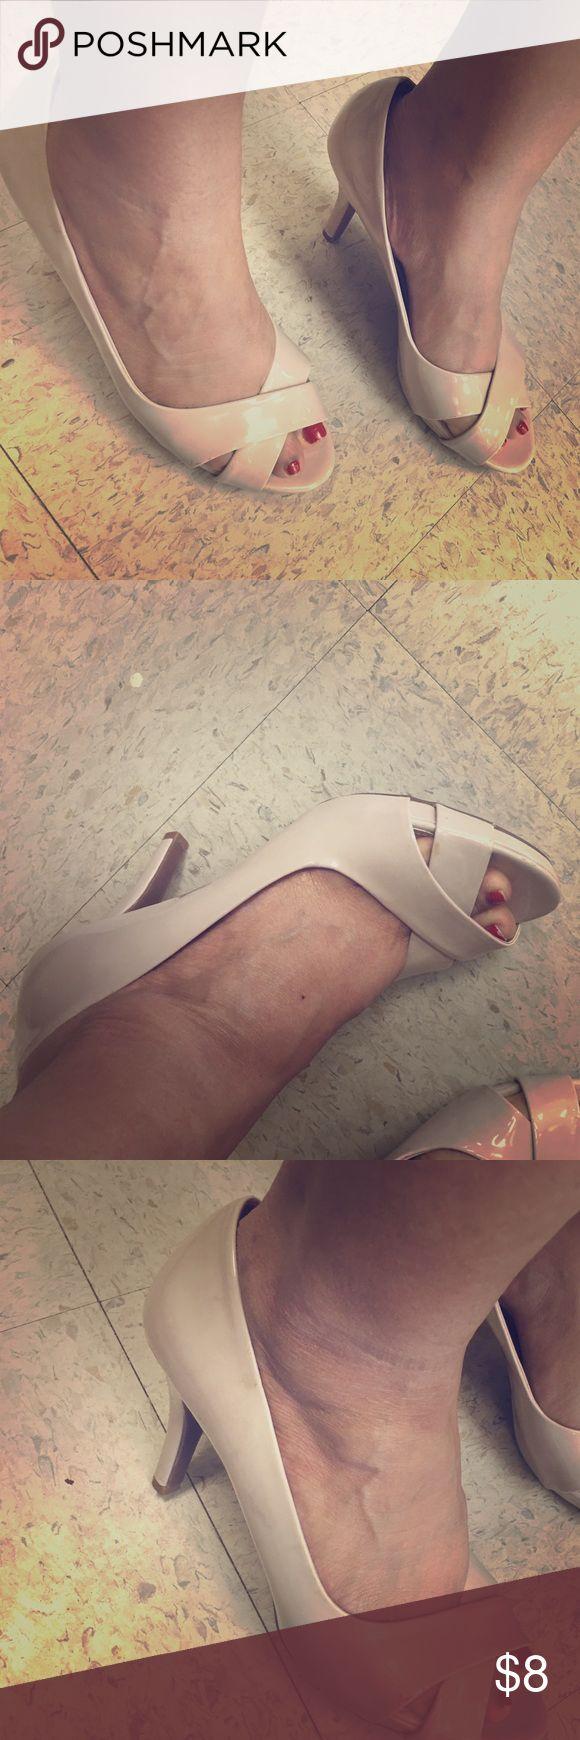 Cream high heels Good condition heels color beige size 9m Shoes